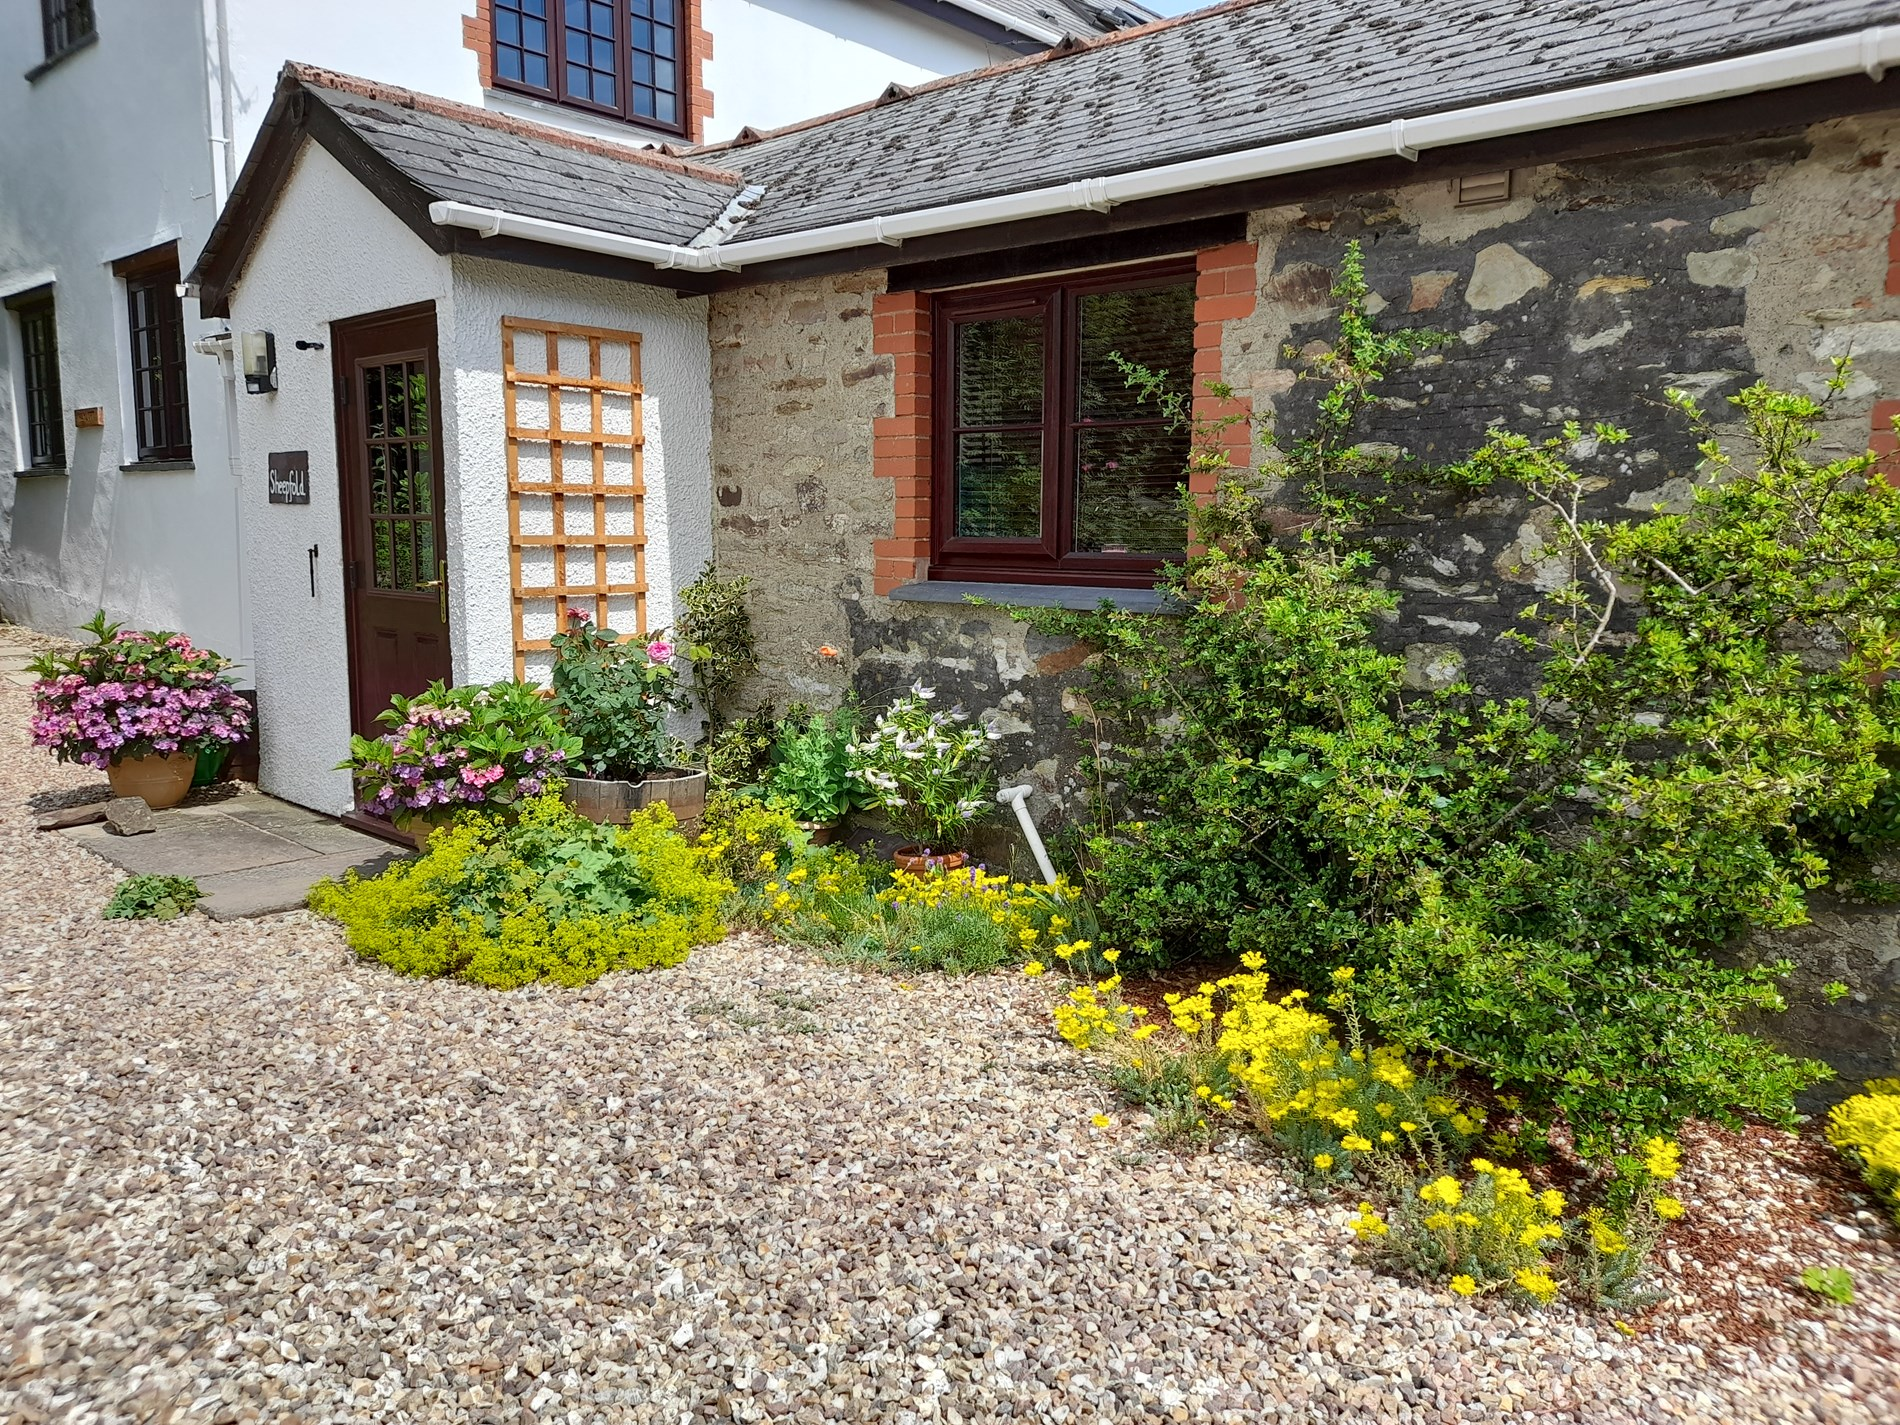 1 Bedroom Cottage in Dulverton, Dorset and Somerset